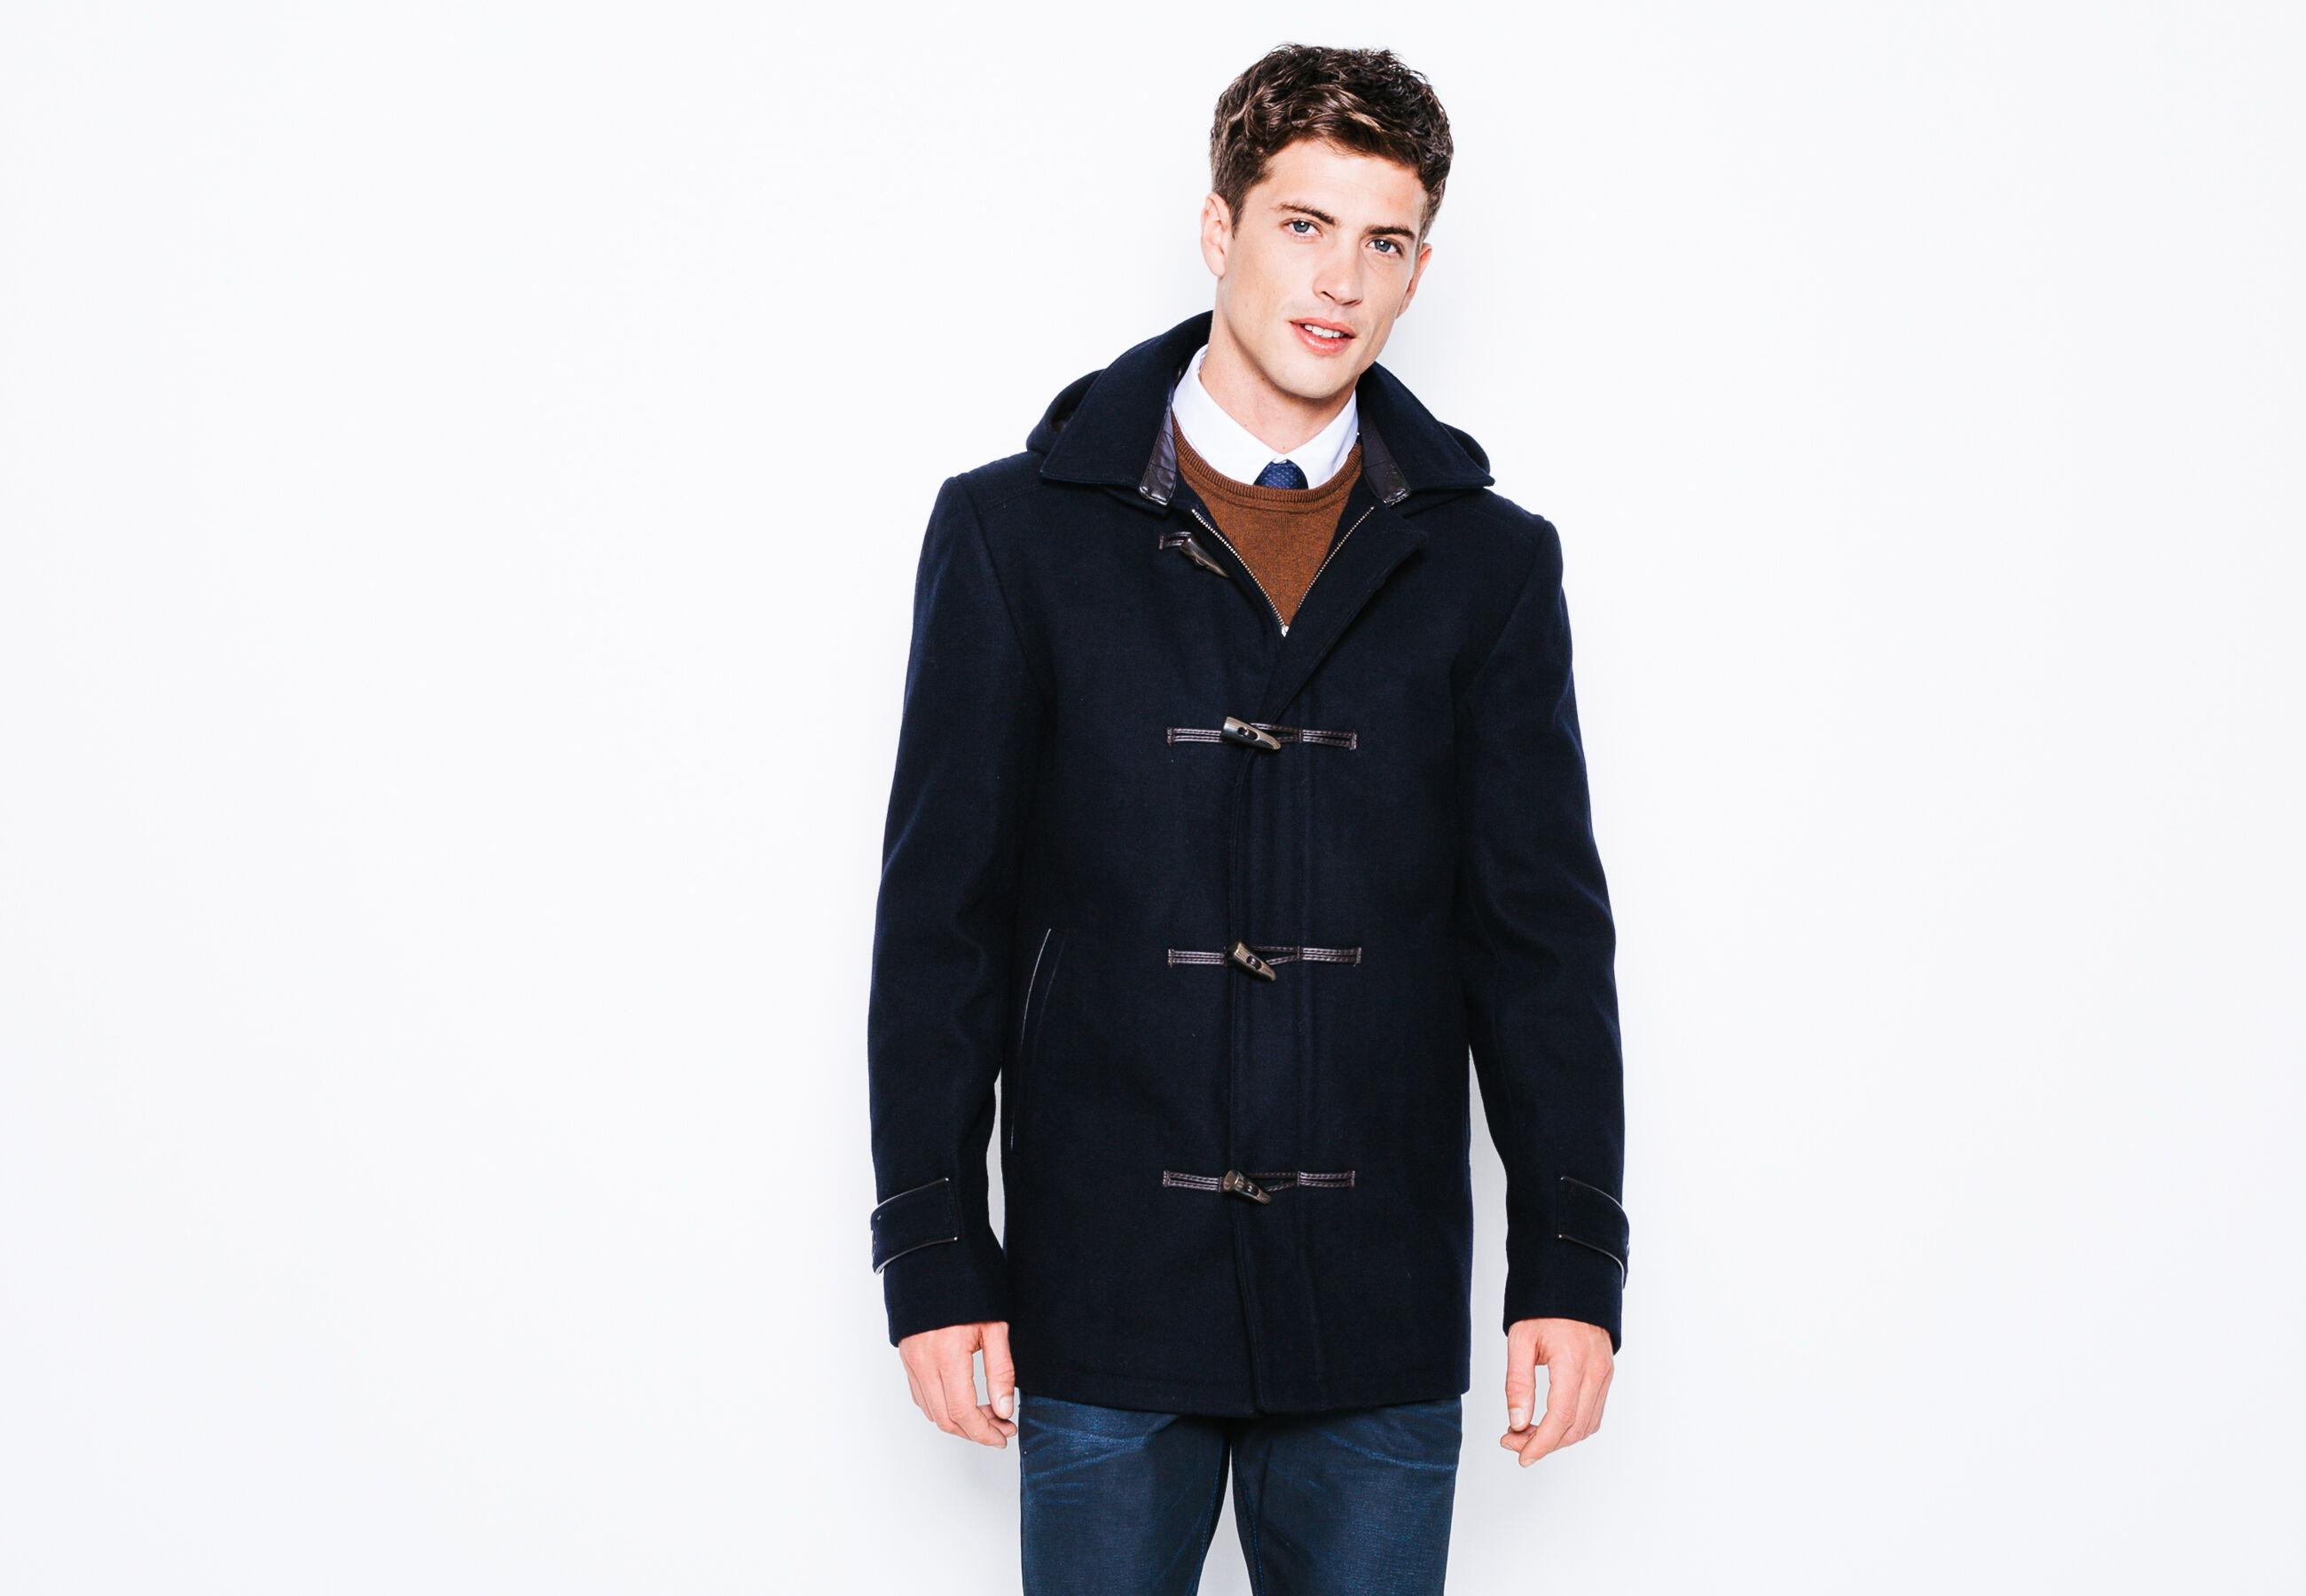 manteau lainage type duffle coat bleu marine homme jules. Black Bedroom Furniture Sets. Home Design Ideas